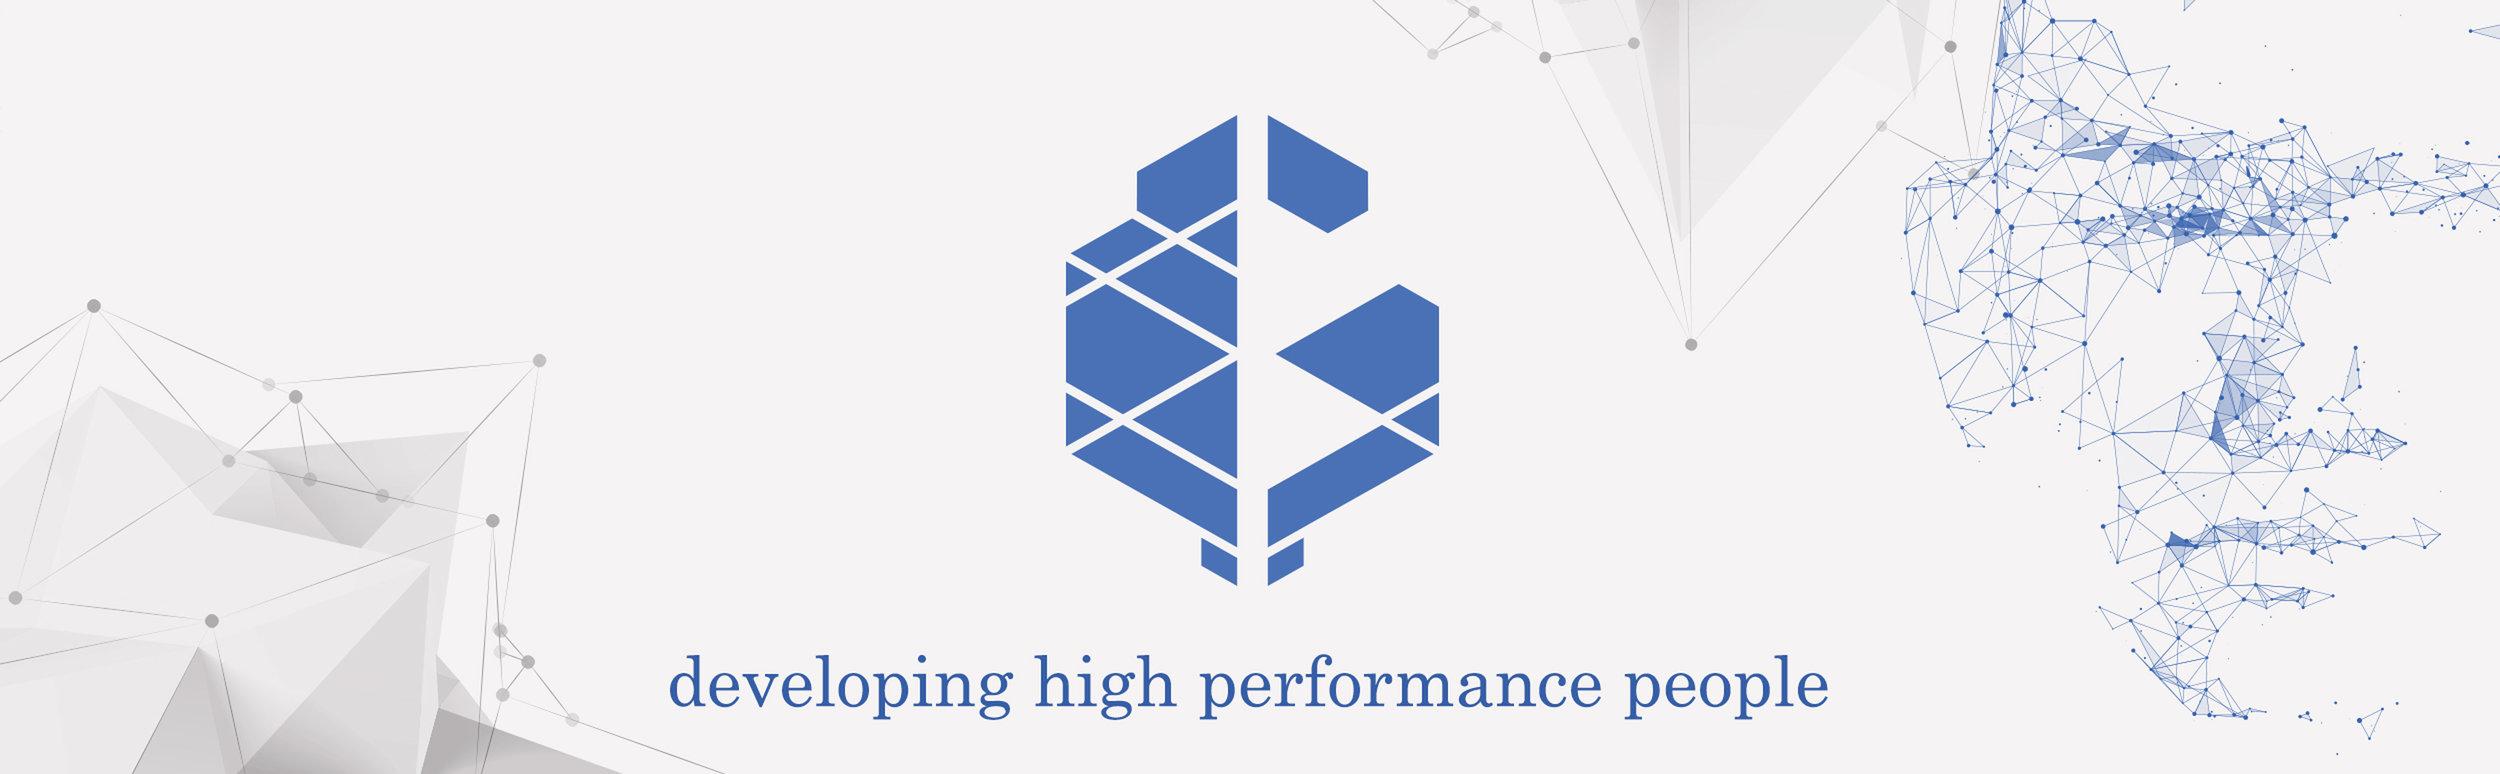 Banner 1 - Developing High Performance People.jpg